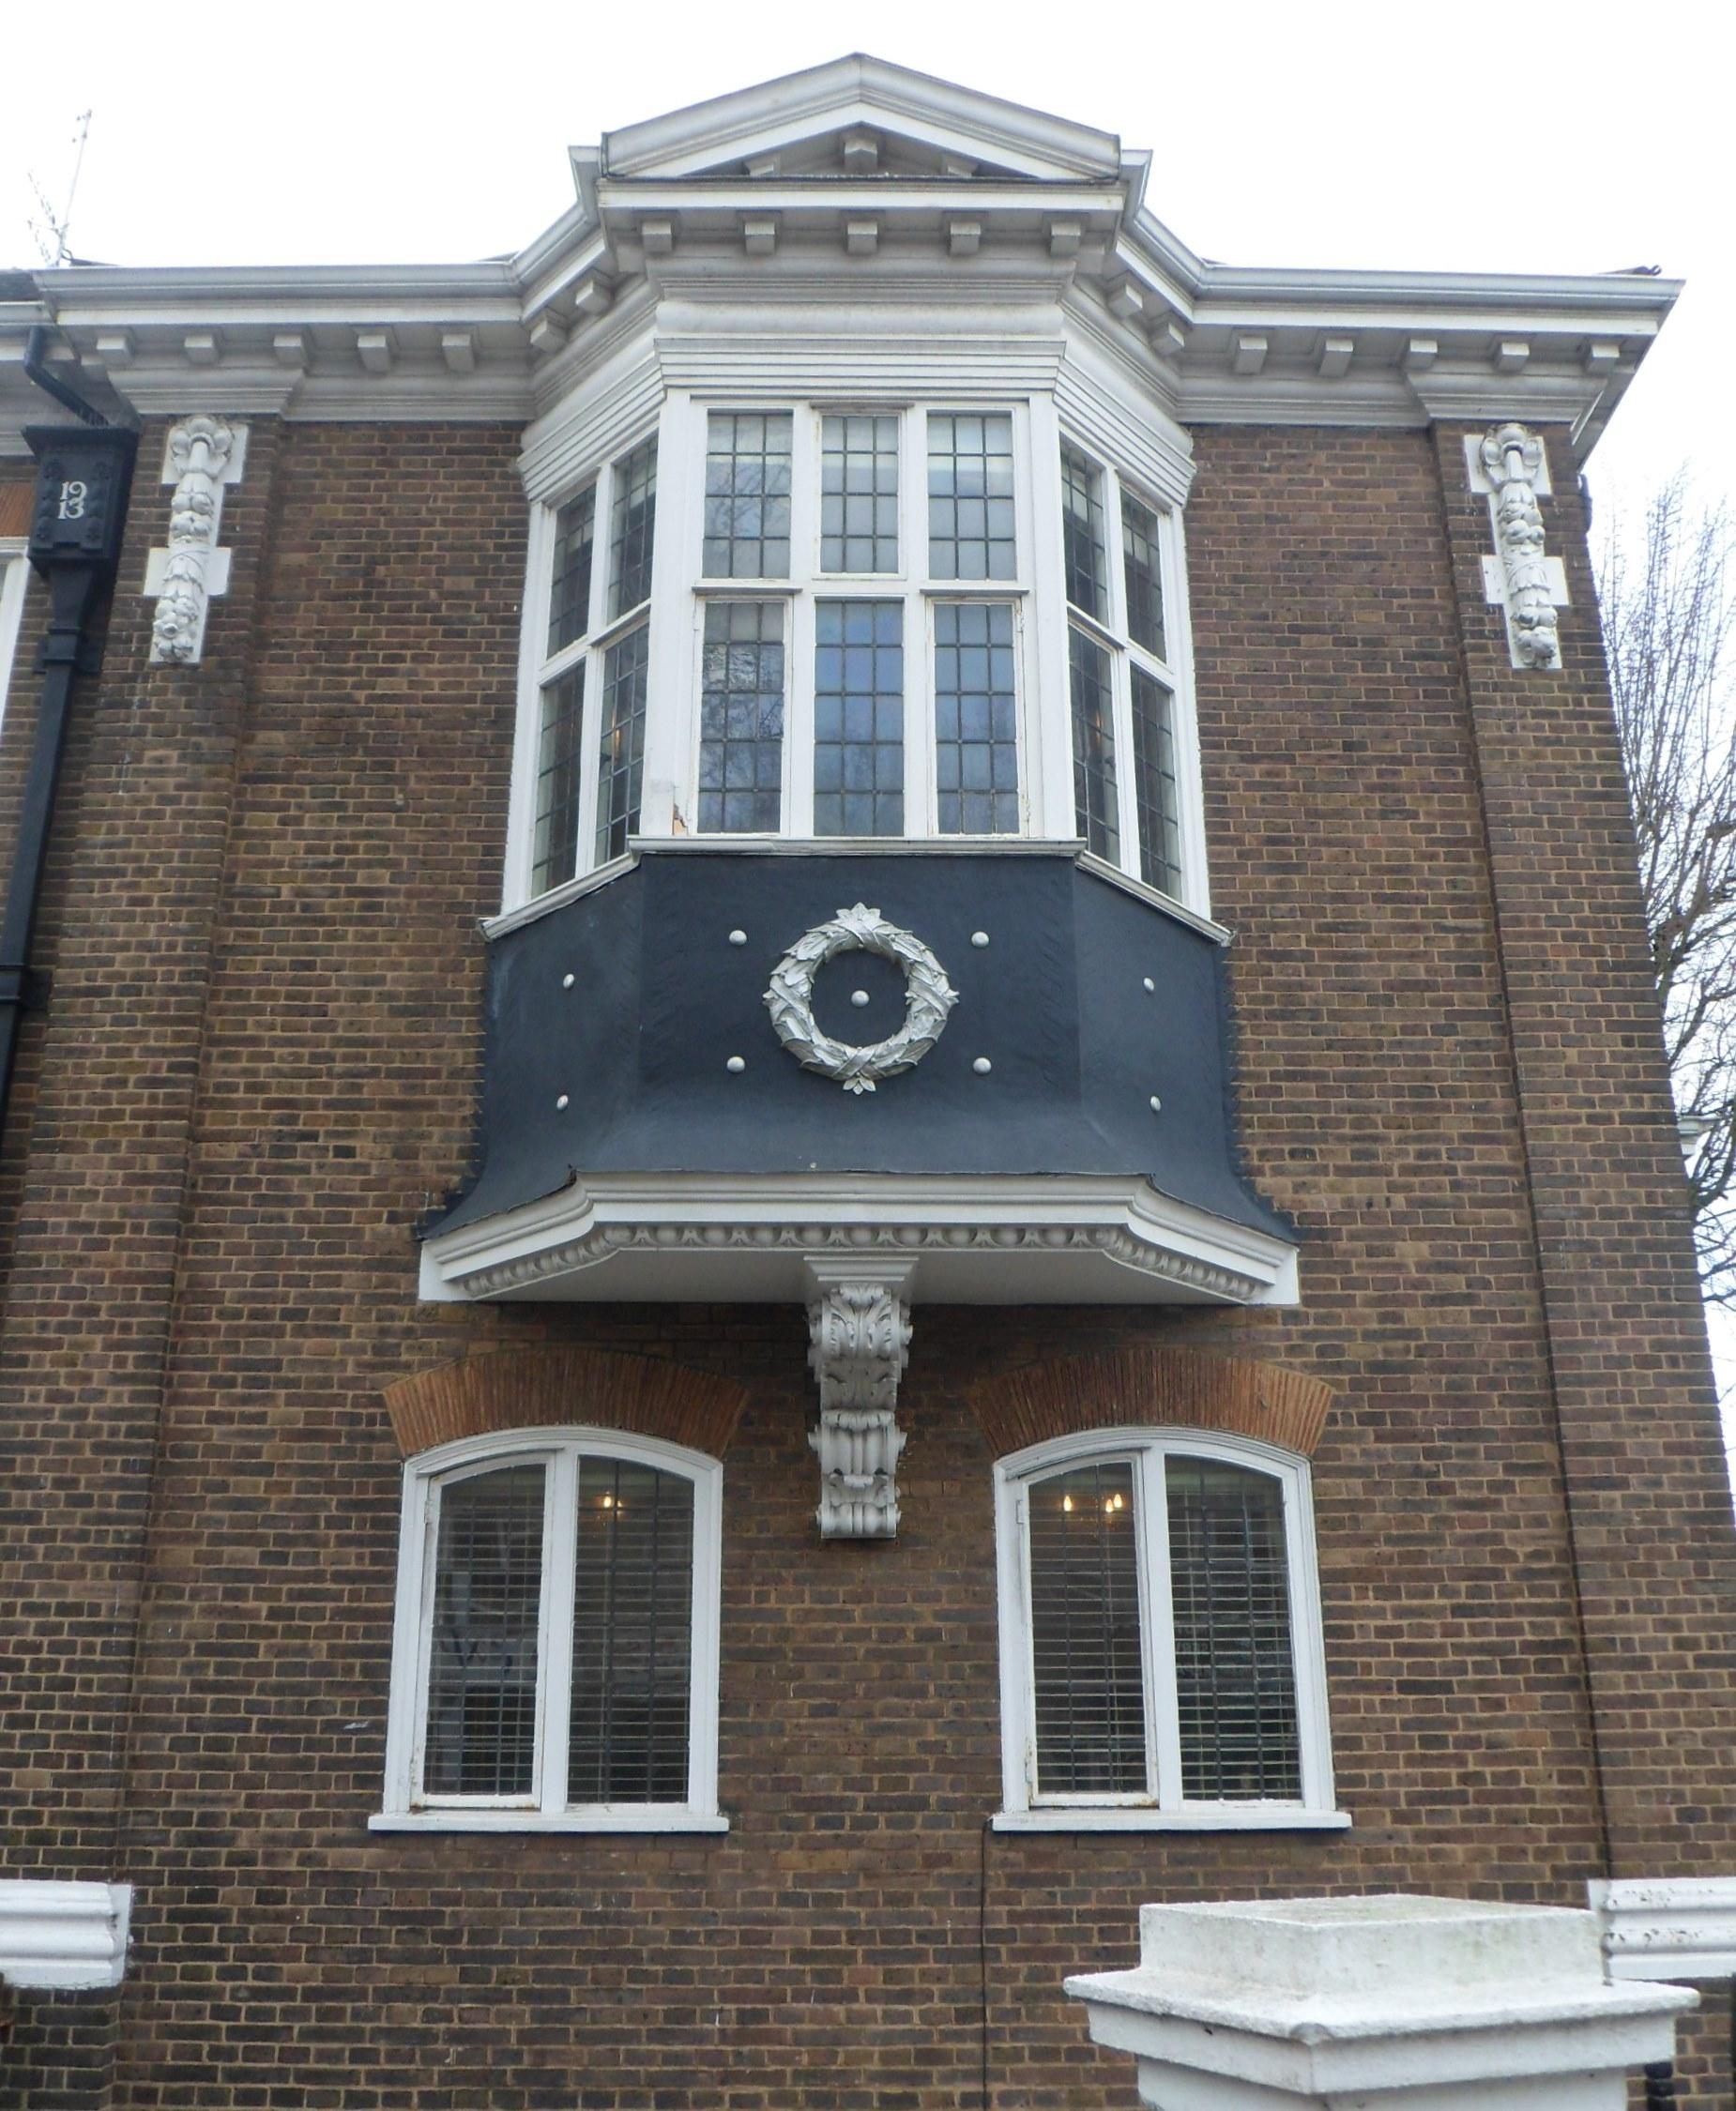 English Tudor Houses File Ralli Hall Denmark Villas Hove March 2013 Oriel